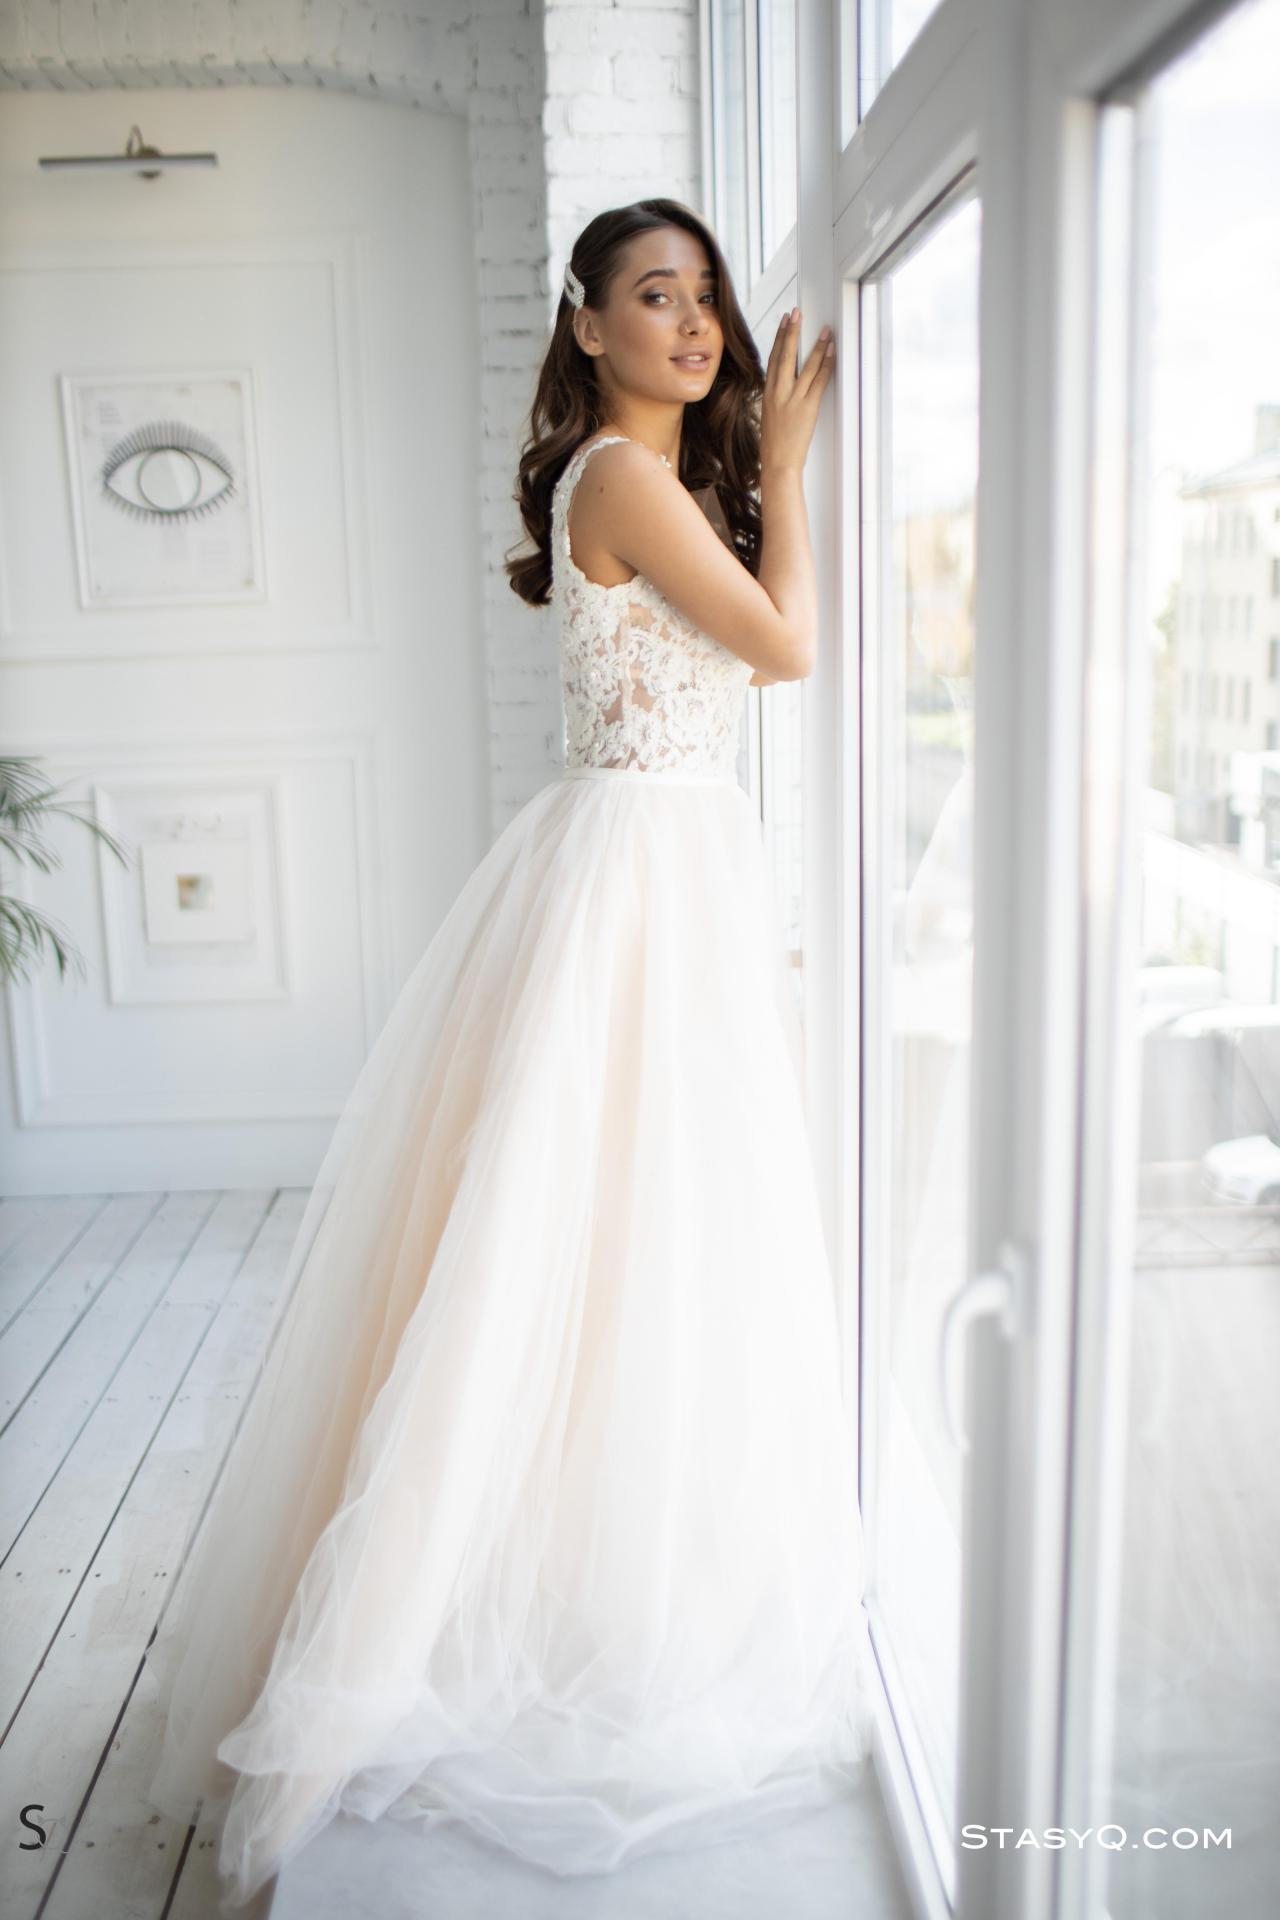 MedinaQ in her wedding dress